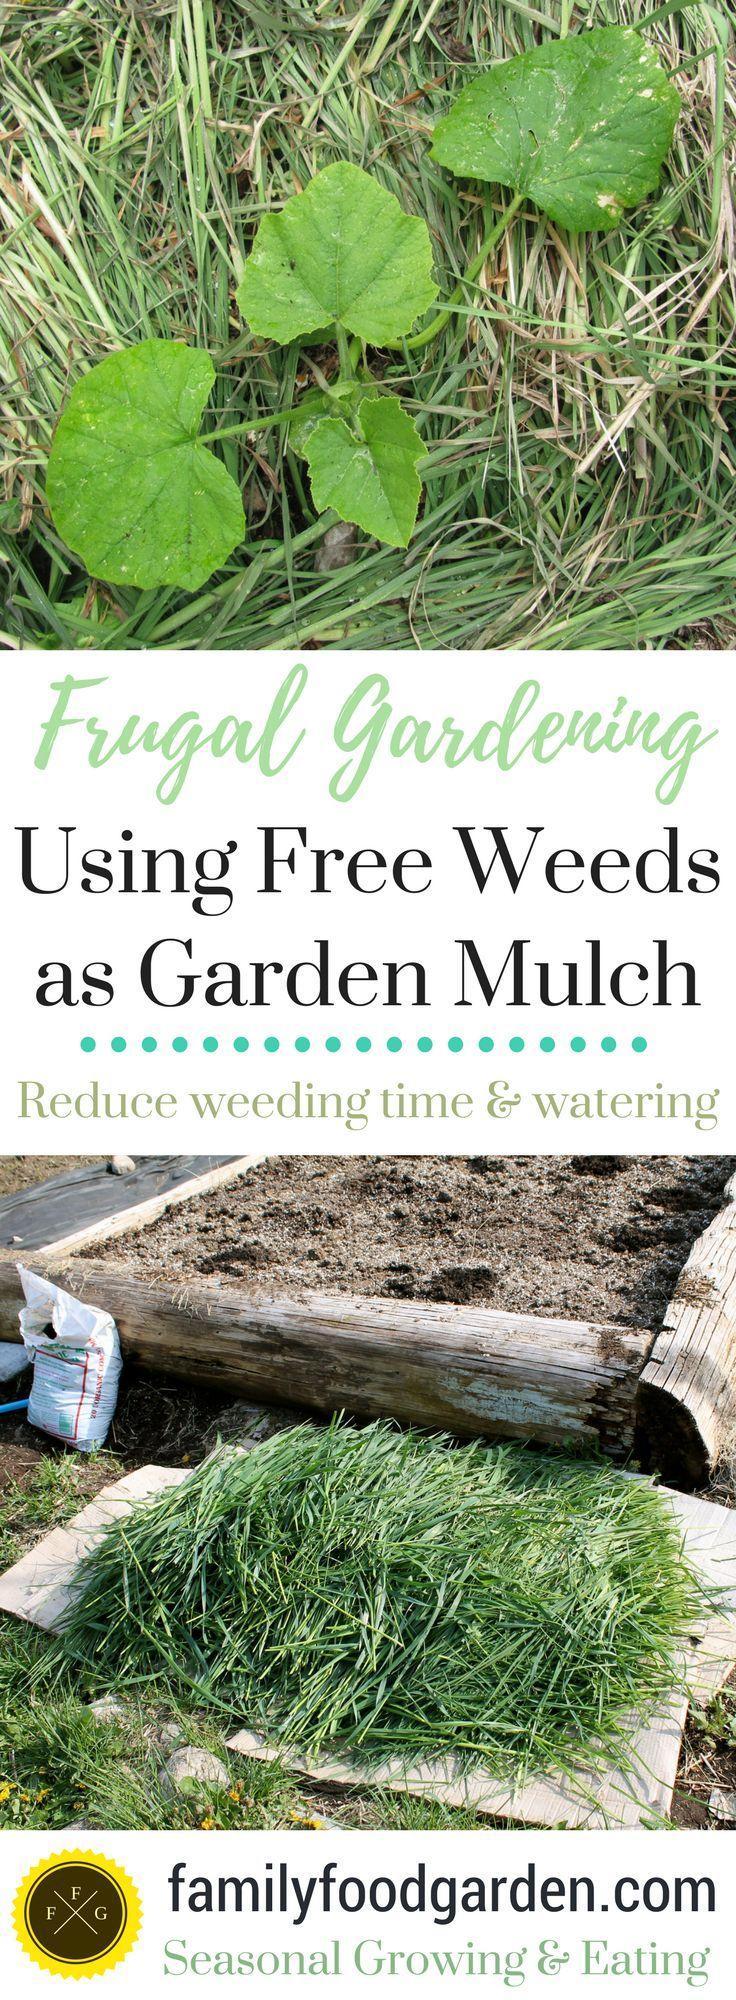 Using weeds as free garden mulch - frugal gardening tips